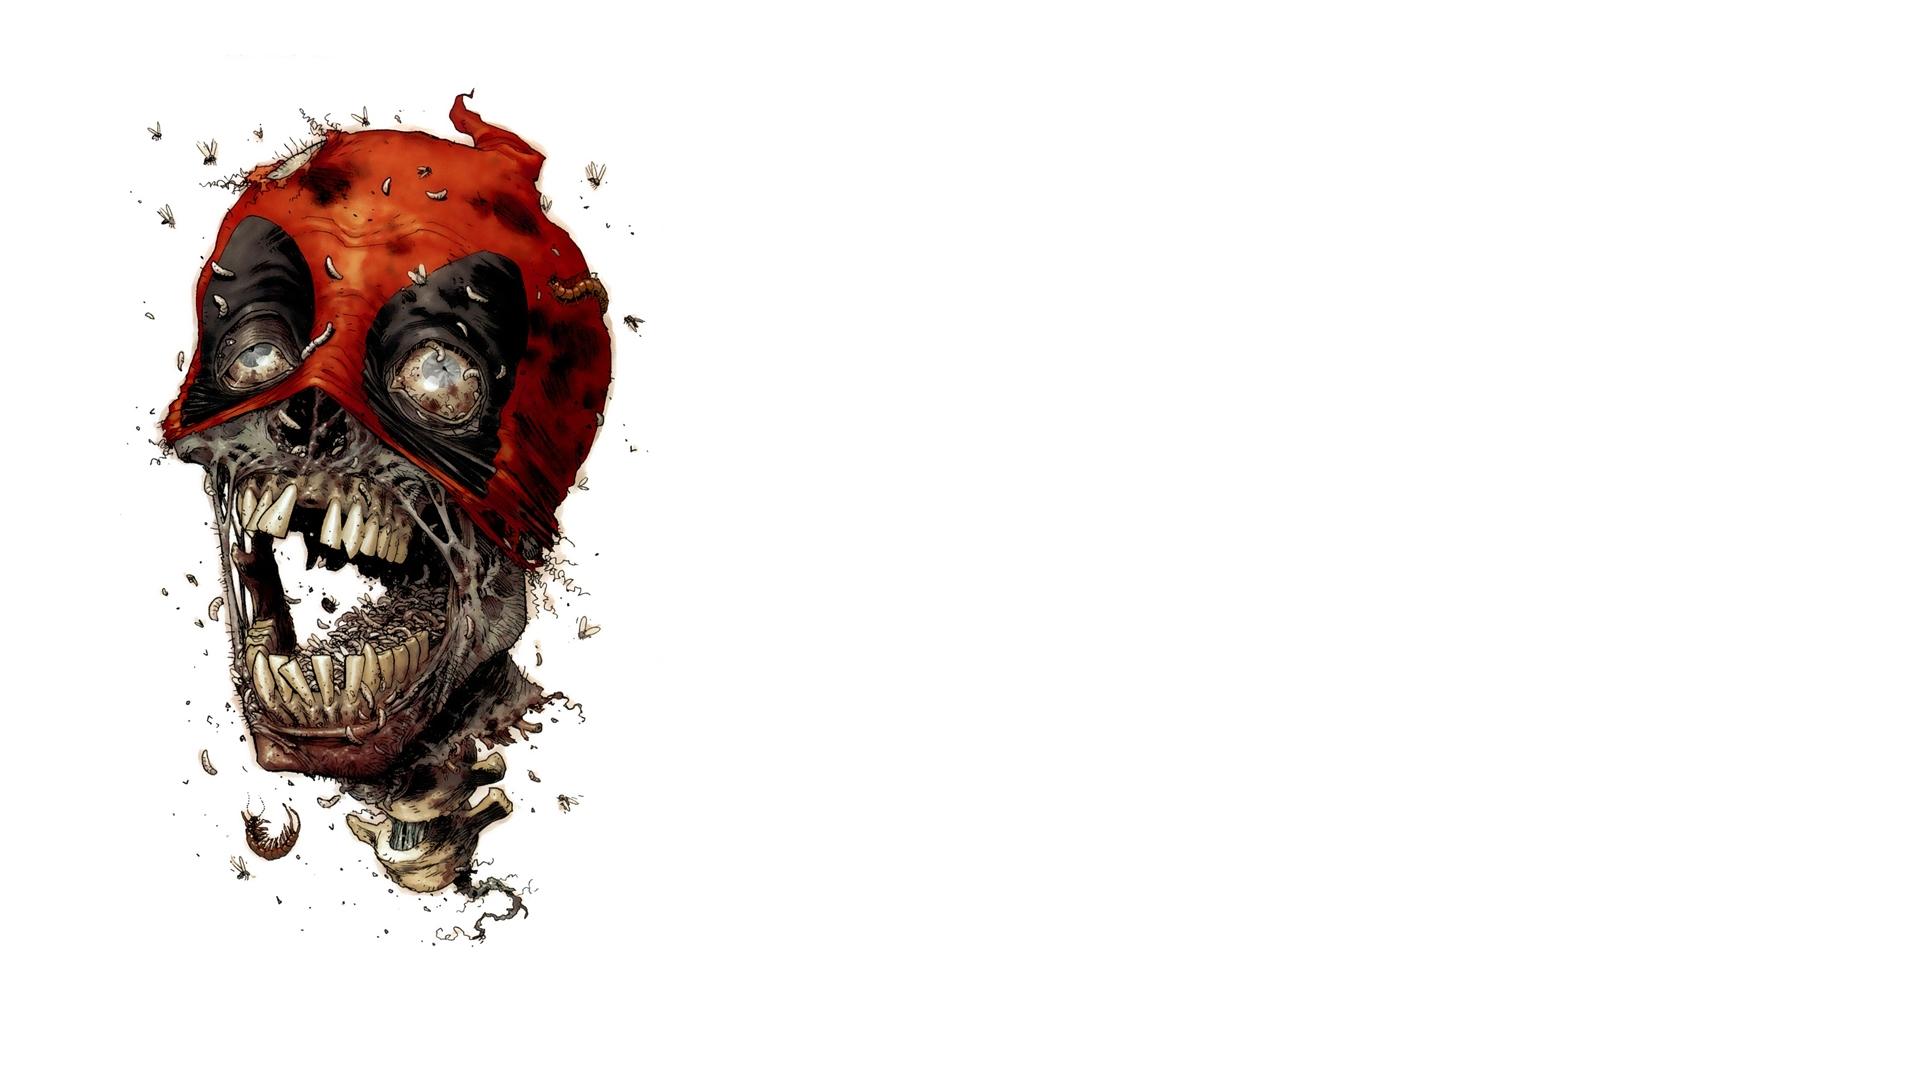 Popular Wallpaper Marvel Face - 1920x1080-px-anti-hero-comics-Deadpool-marvel-mercenary-Wade-Wilson-804239  Gallery_879468.jpg